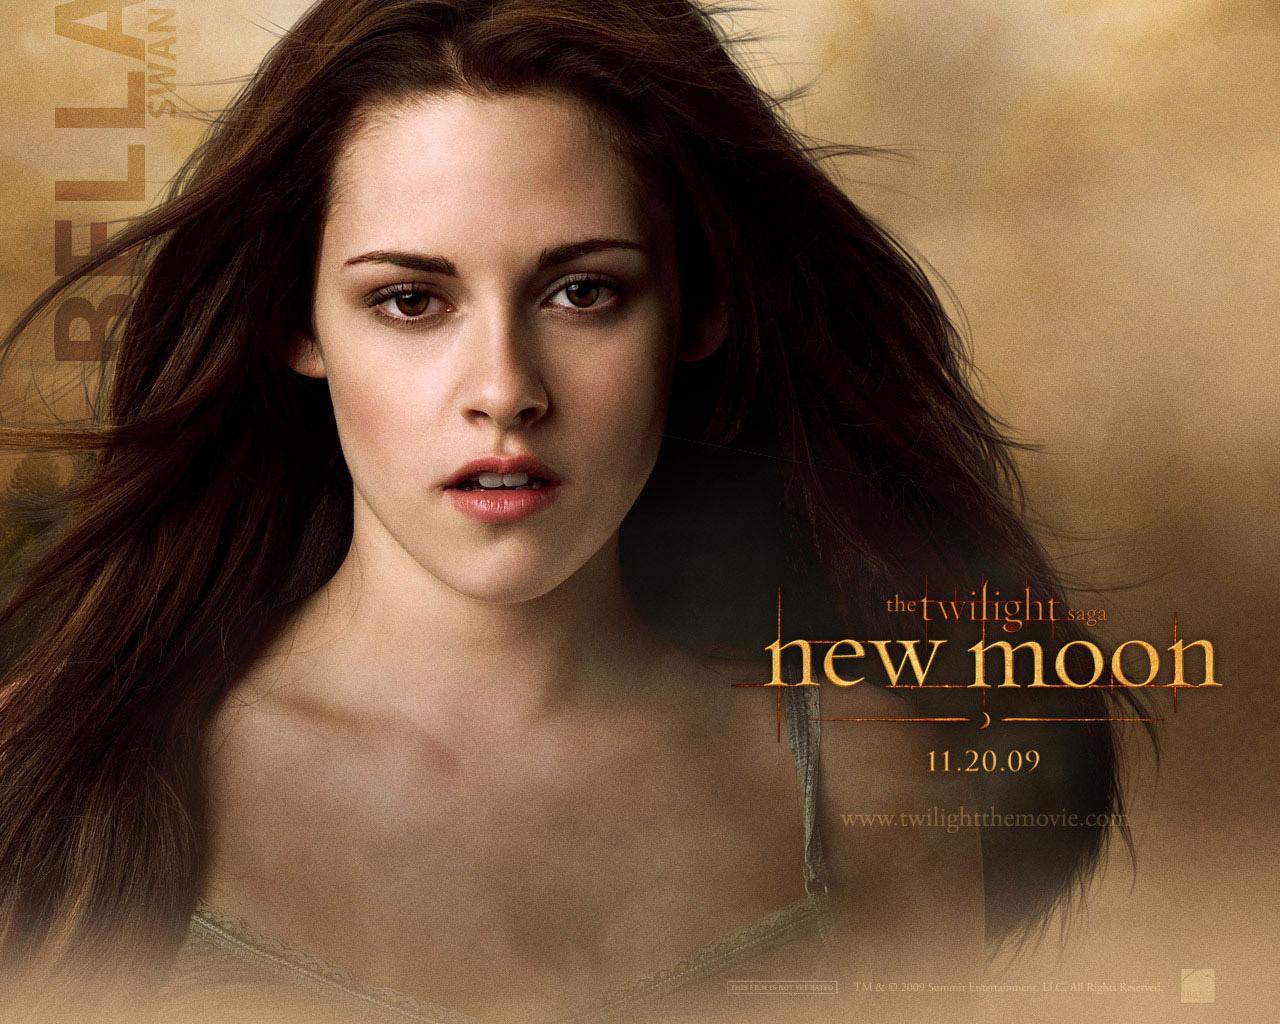 HD Wallpapers Twilight New Moon